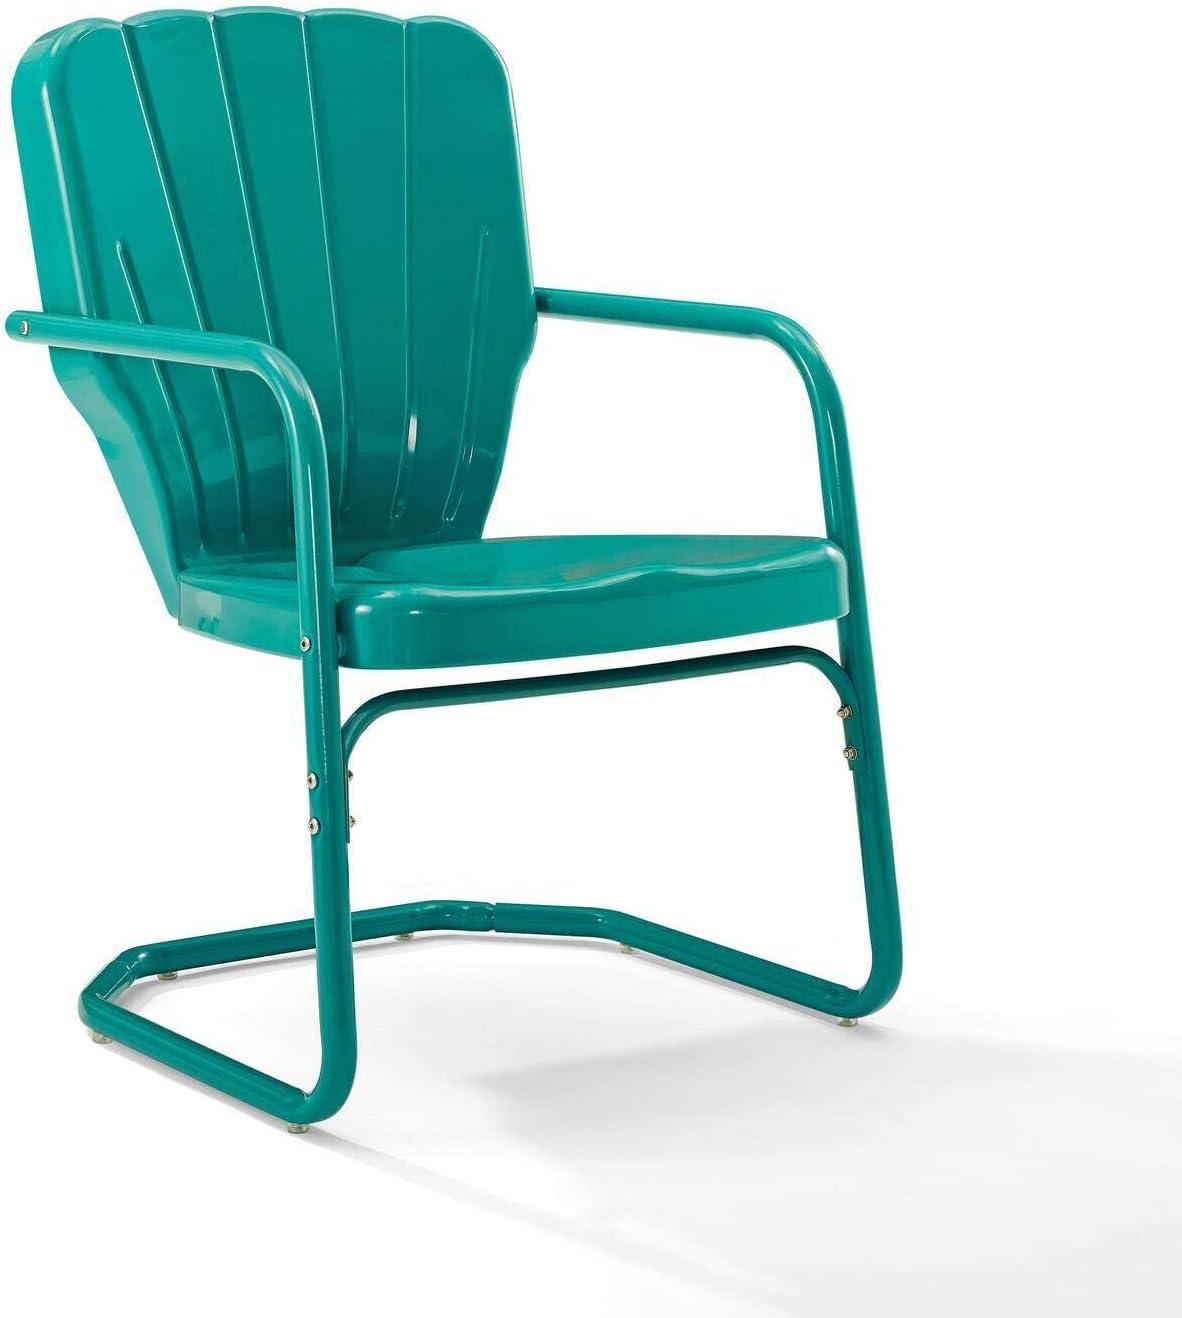 Crosley Furniture Department store CO1031-TU Ridgeland Metal Retro Popular products Chair Turquoi